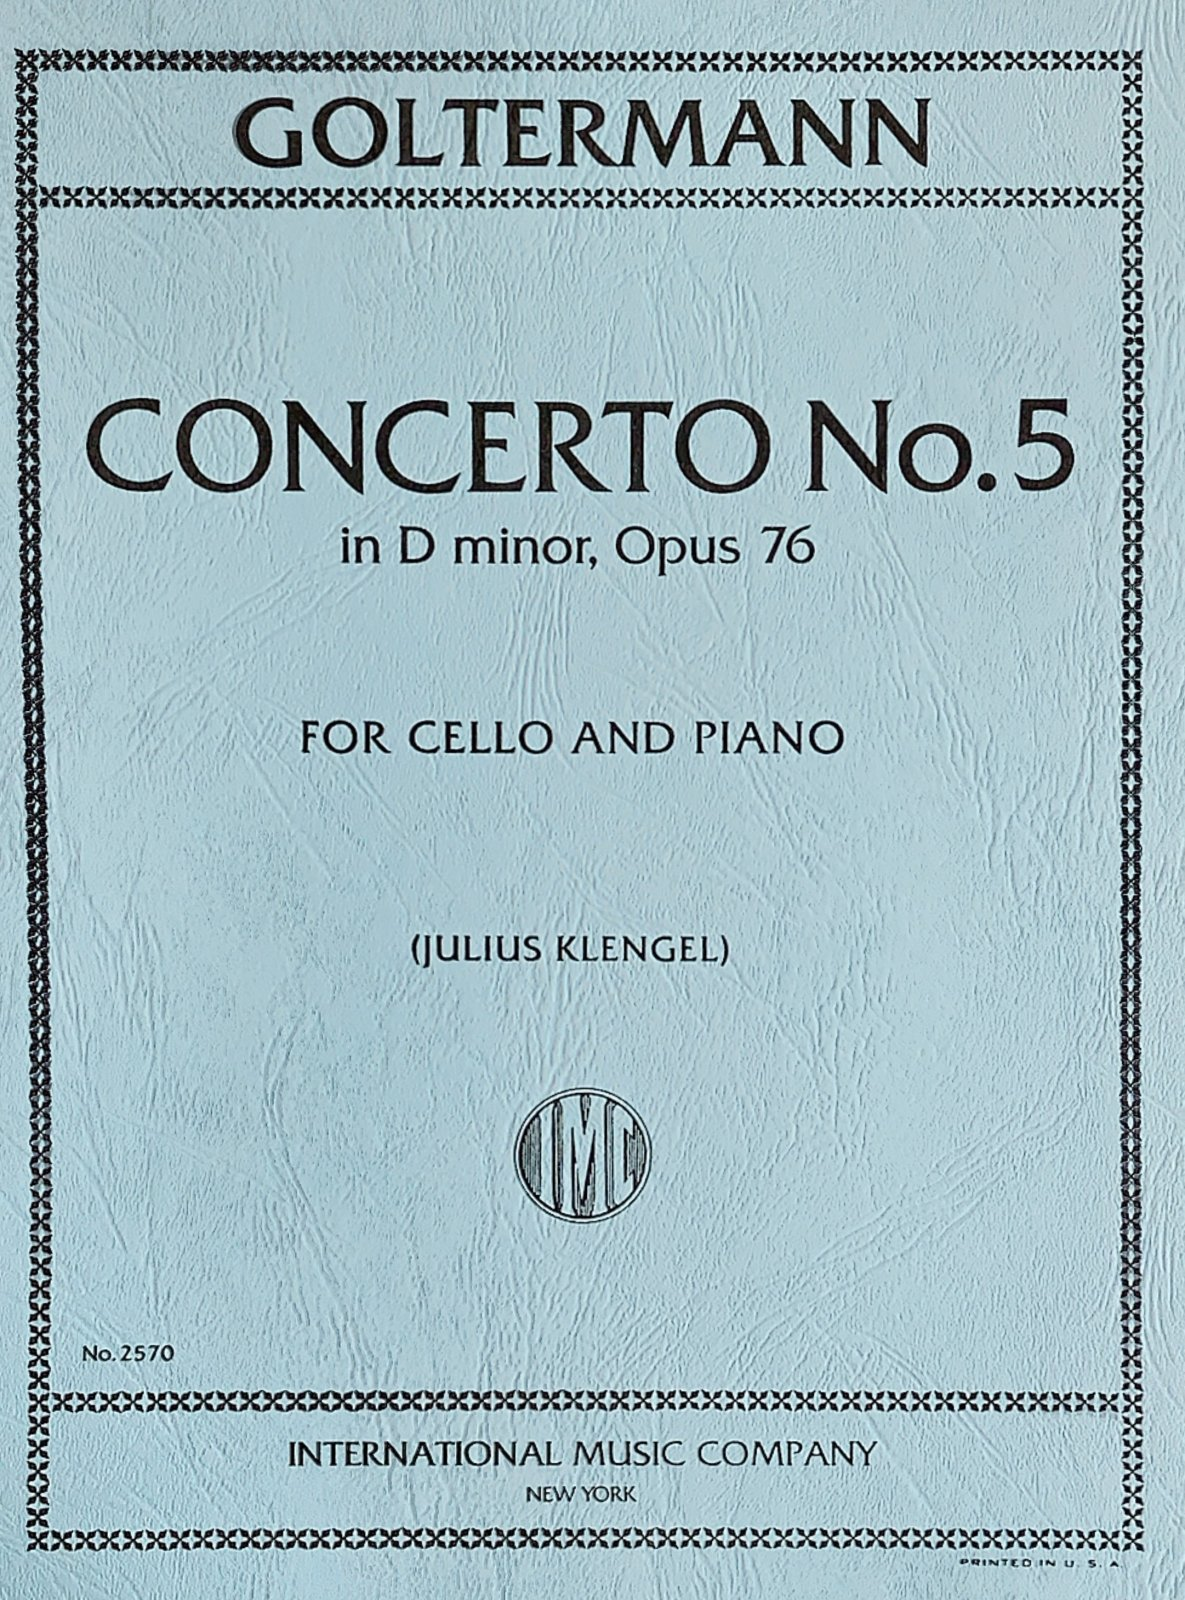 Concerto # 5 in D Minor Op 76 - Goltermann - Cello - Klengel - International